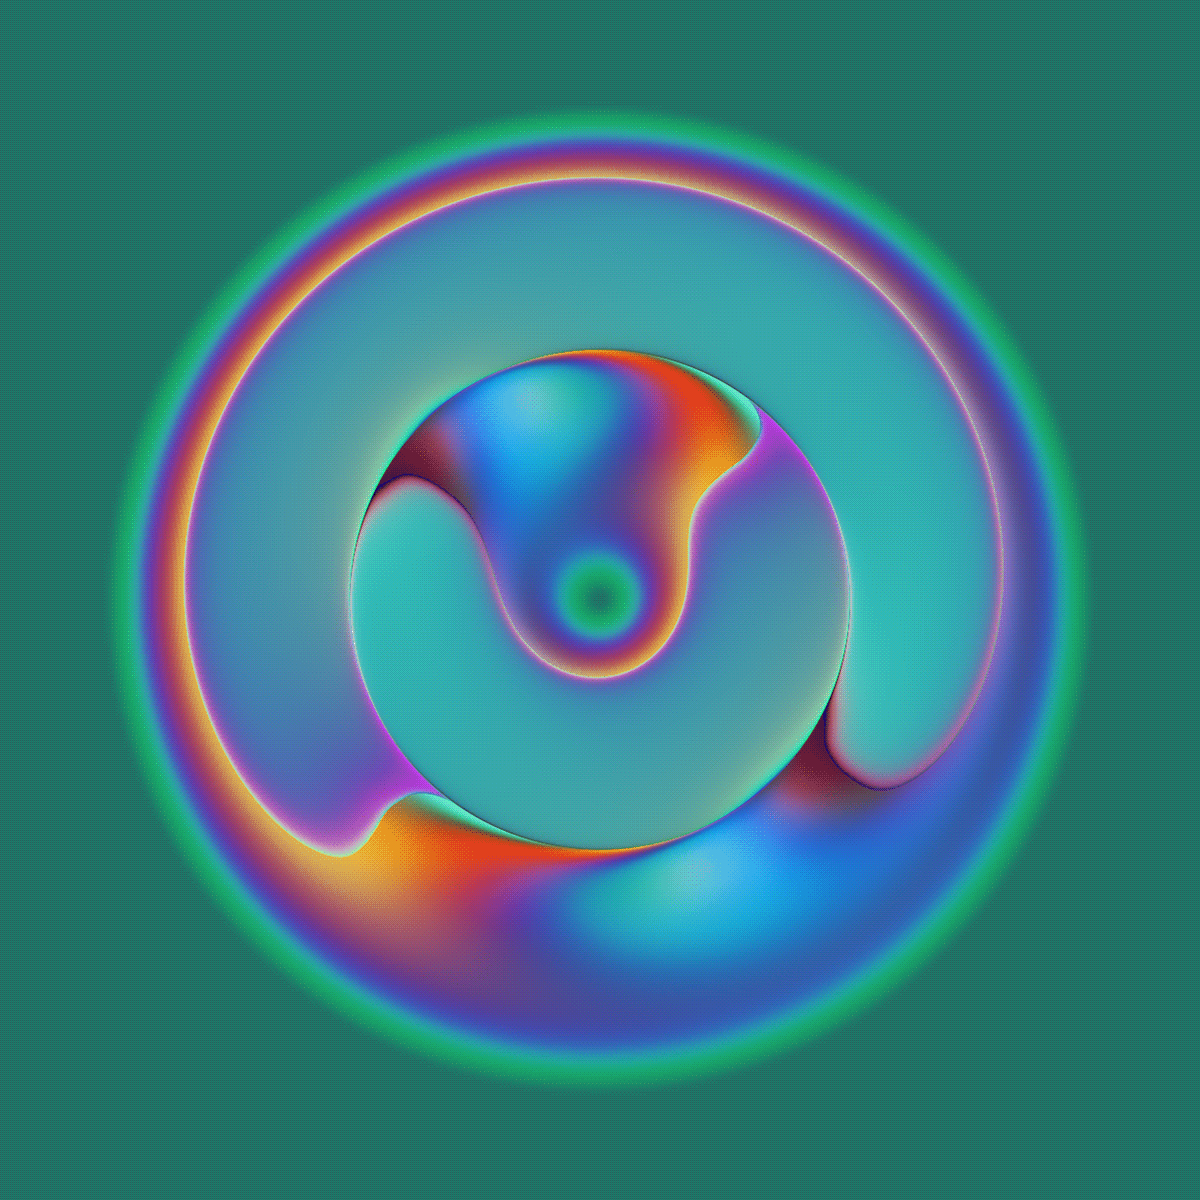 Image may contain: abstract, circle and colorfulness